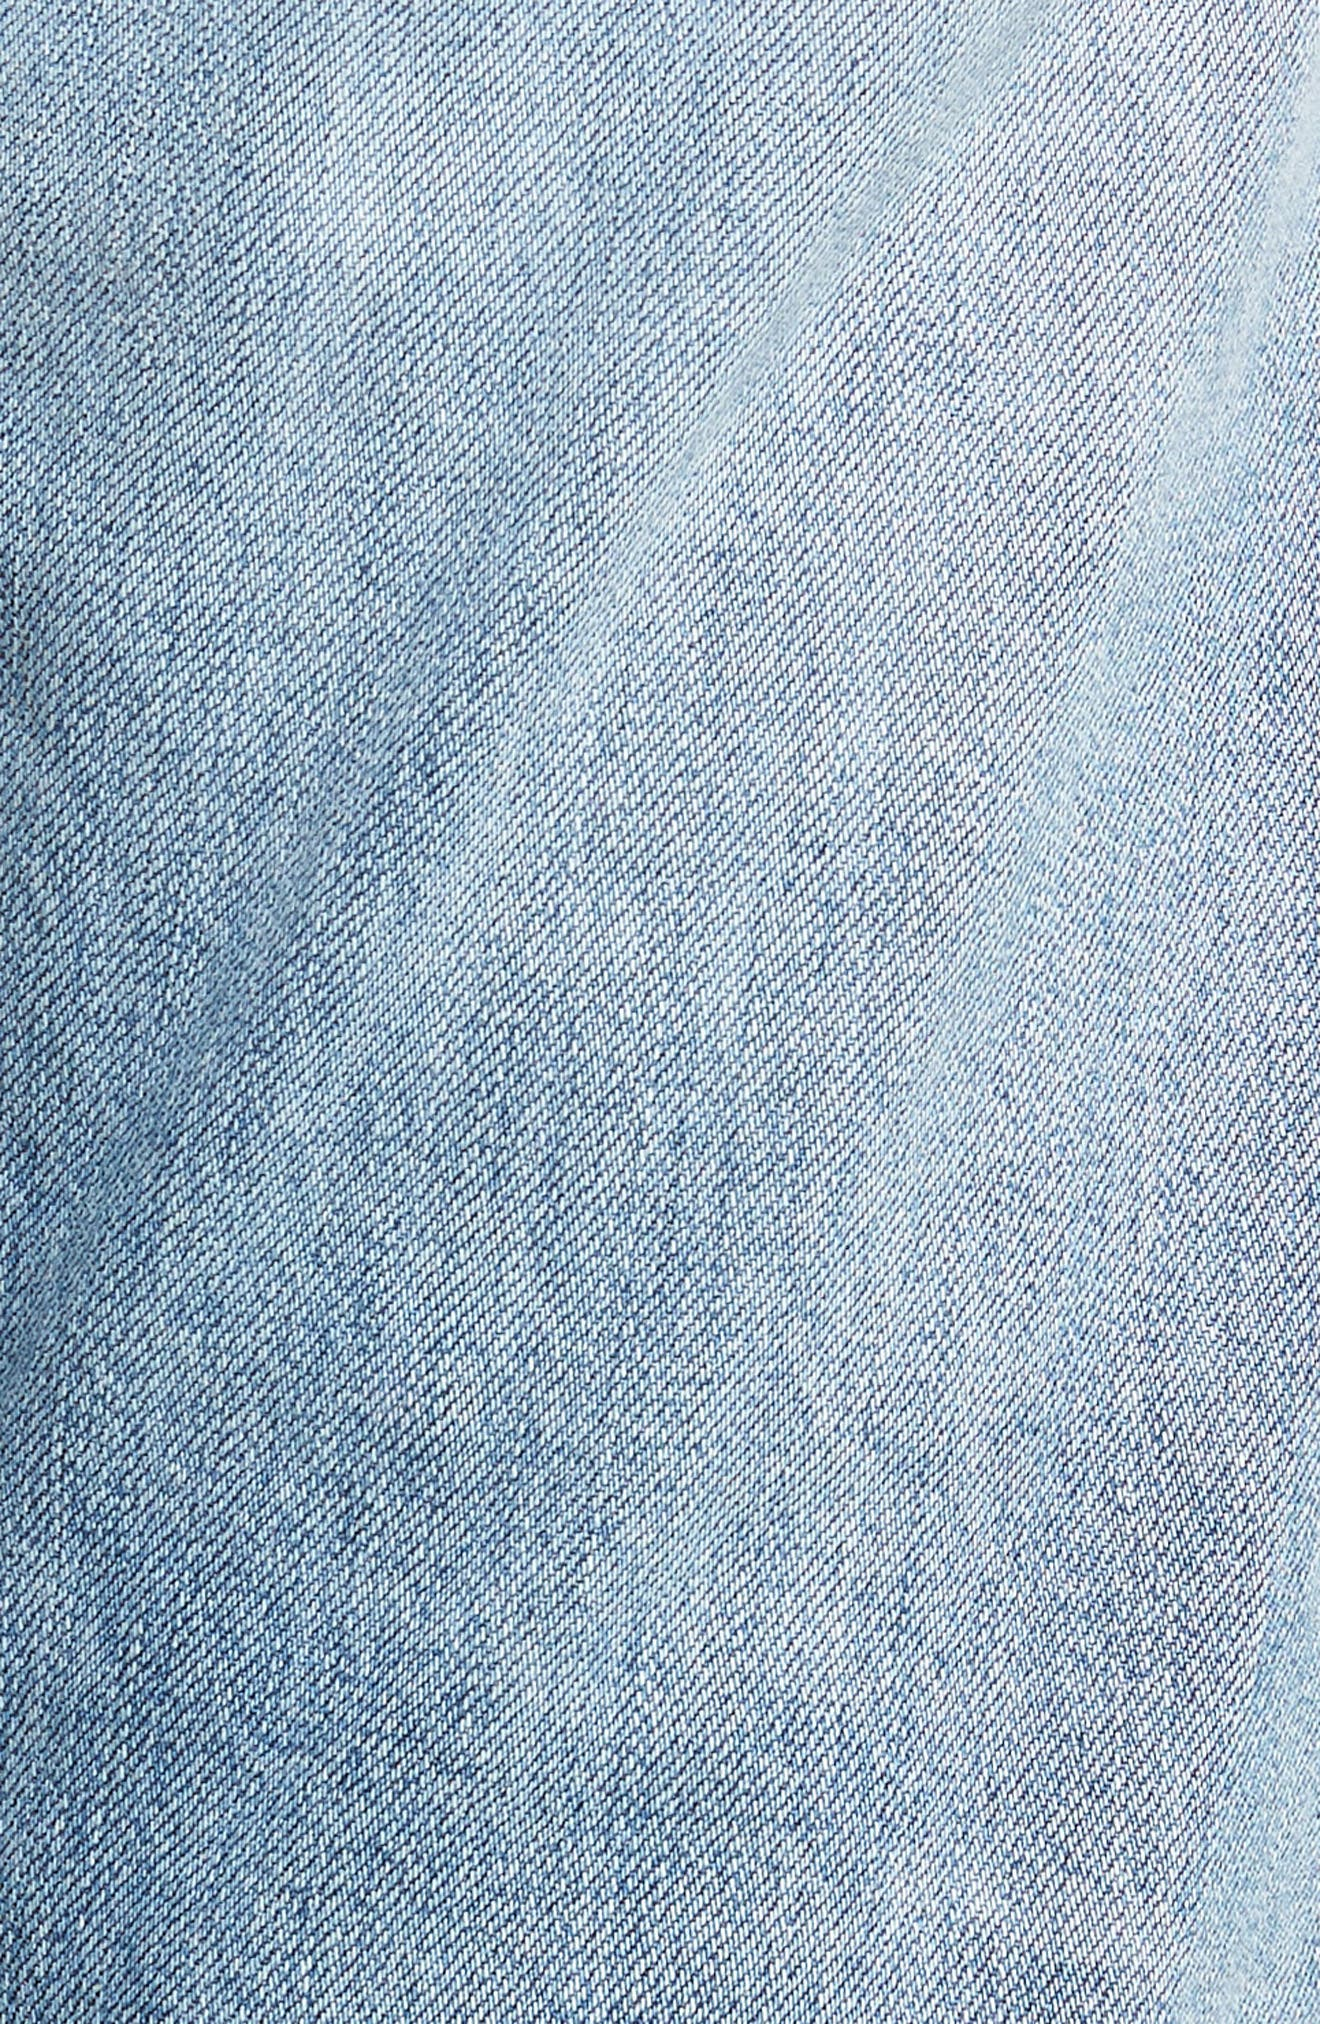 Emerson Slim Fit Boyfriend Jeans,                             Alternate thumbnail 6, color,                             SUNDAY MORNING